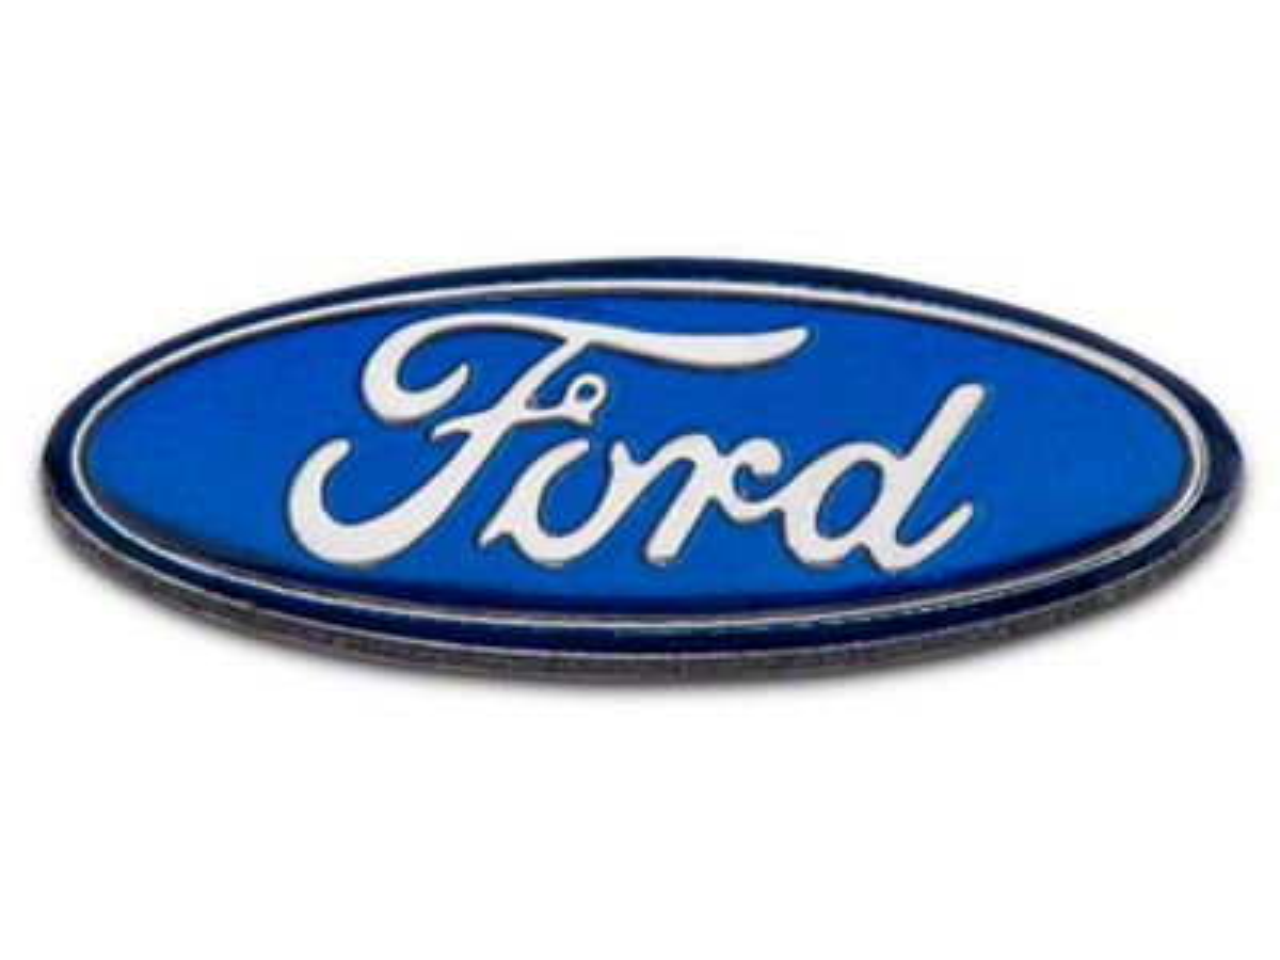 OPR Steering Wheel Ford Emblem (84-89 All, Excluding SVO)